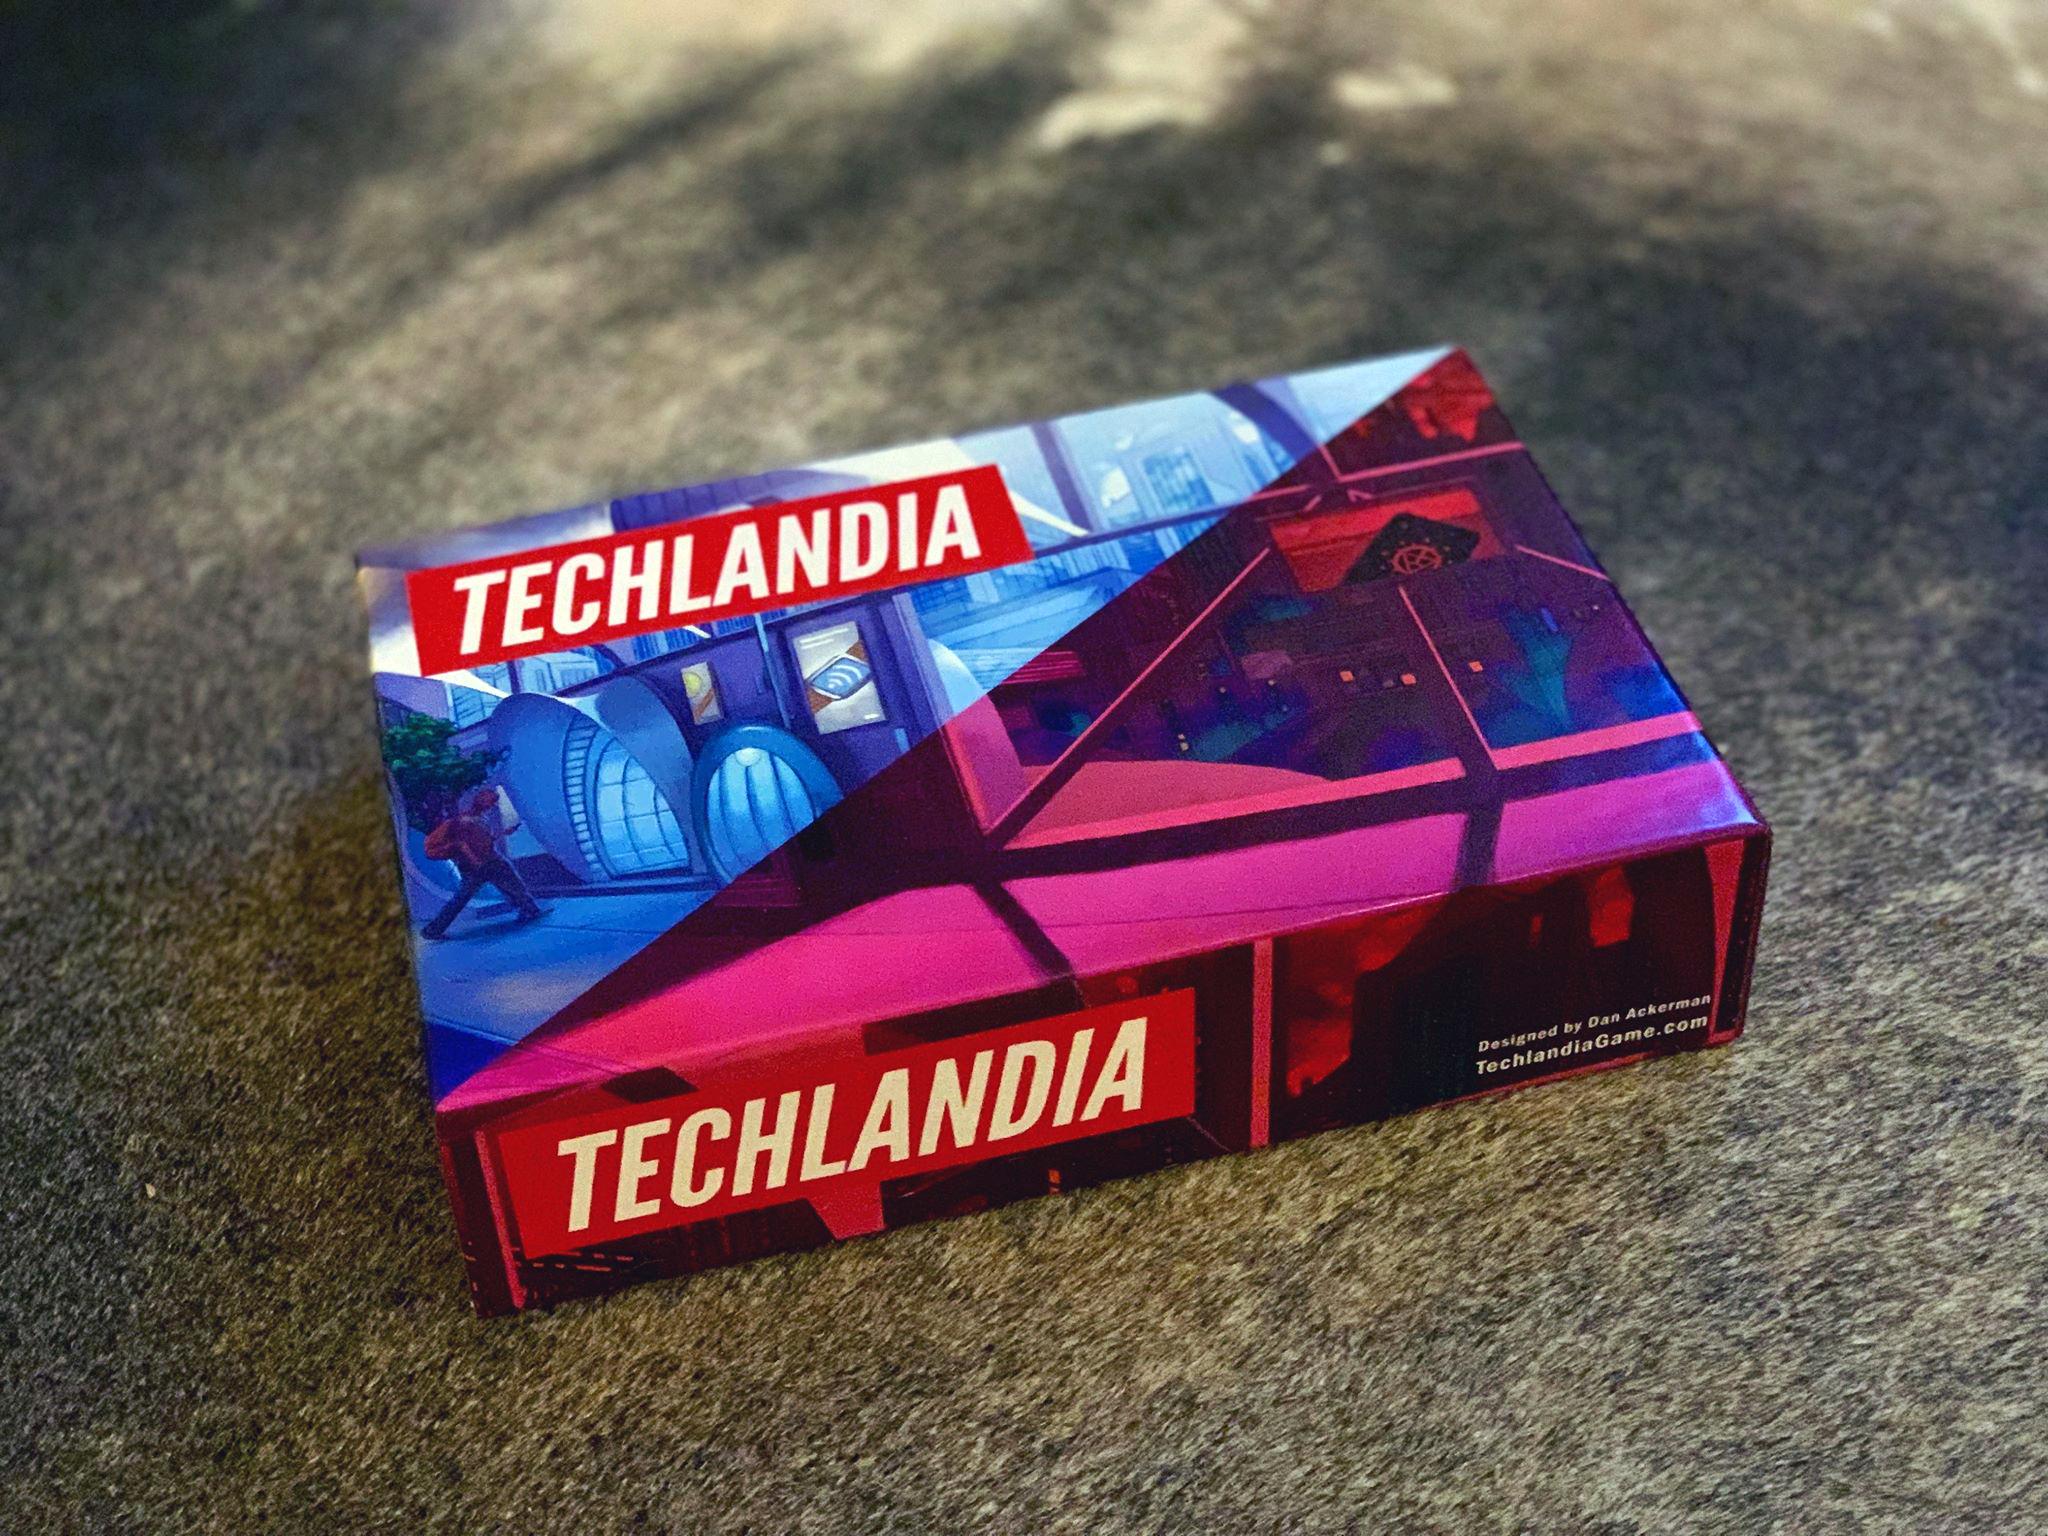 techlandia-box-2.jpg